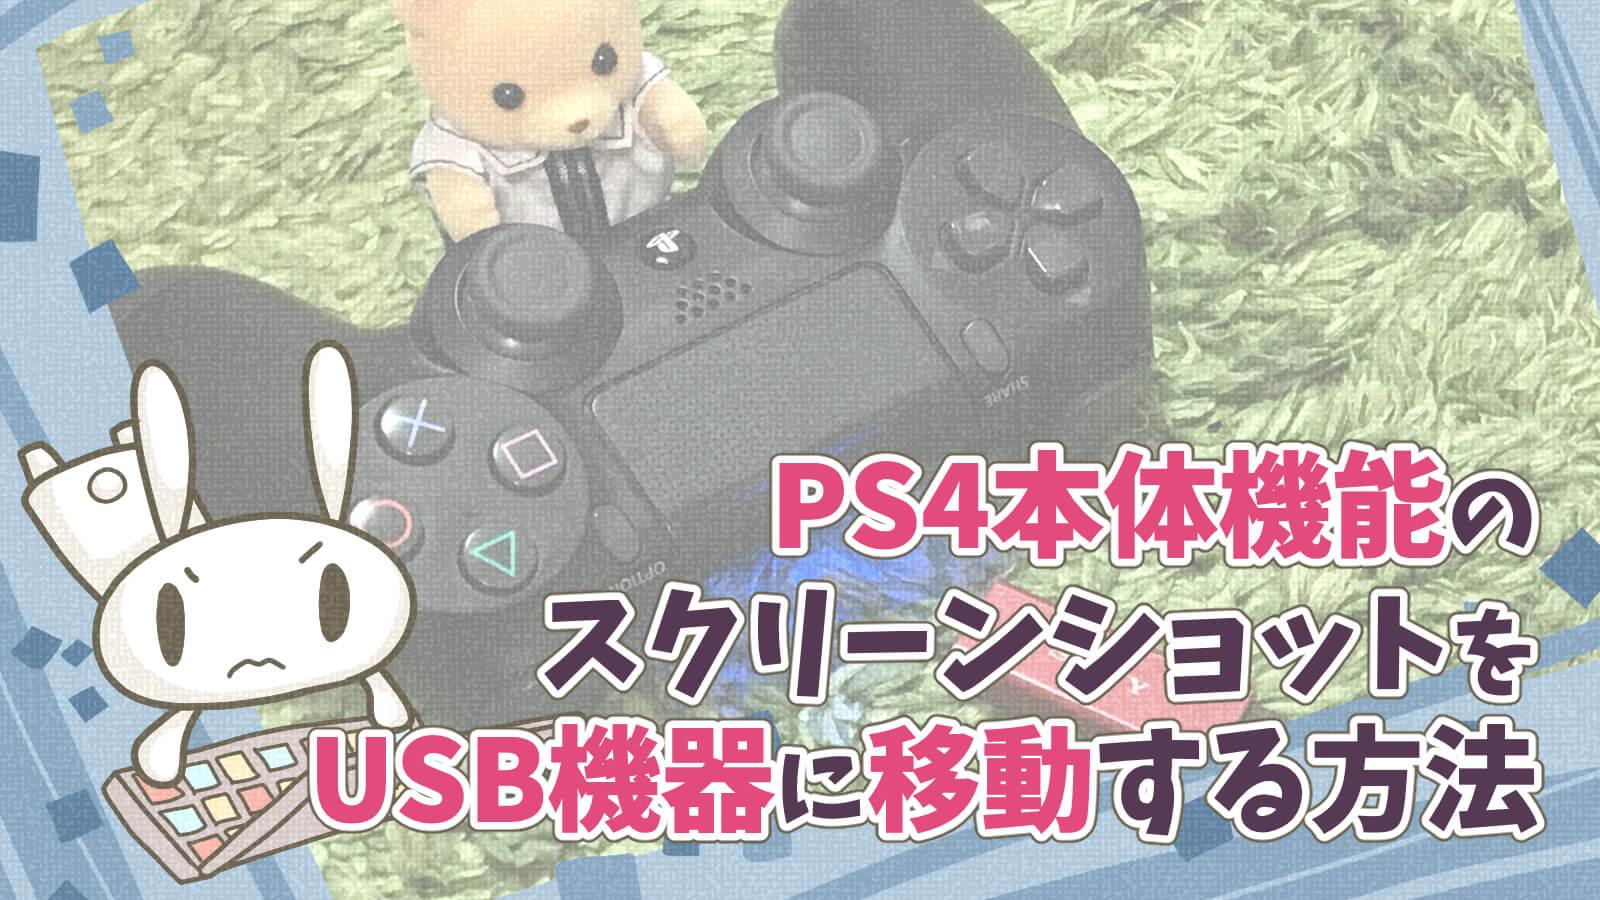 PS4本体機能のスクリーンショットをUSB機器を使って抜き出す方法